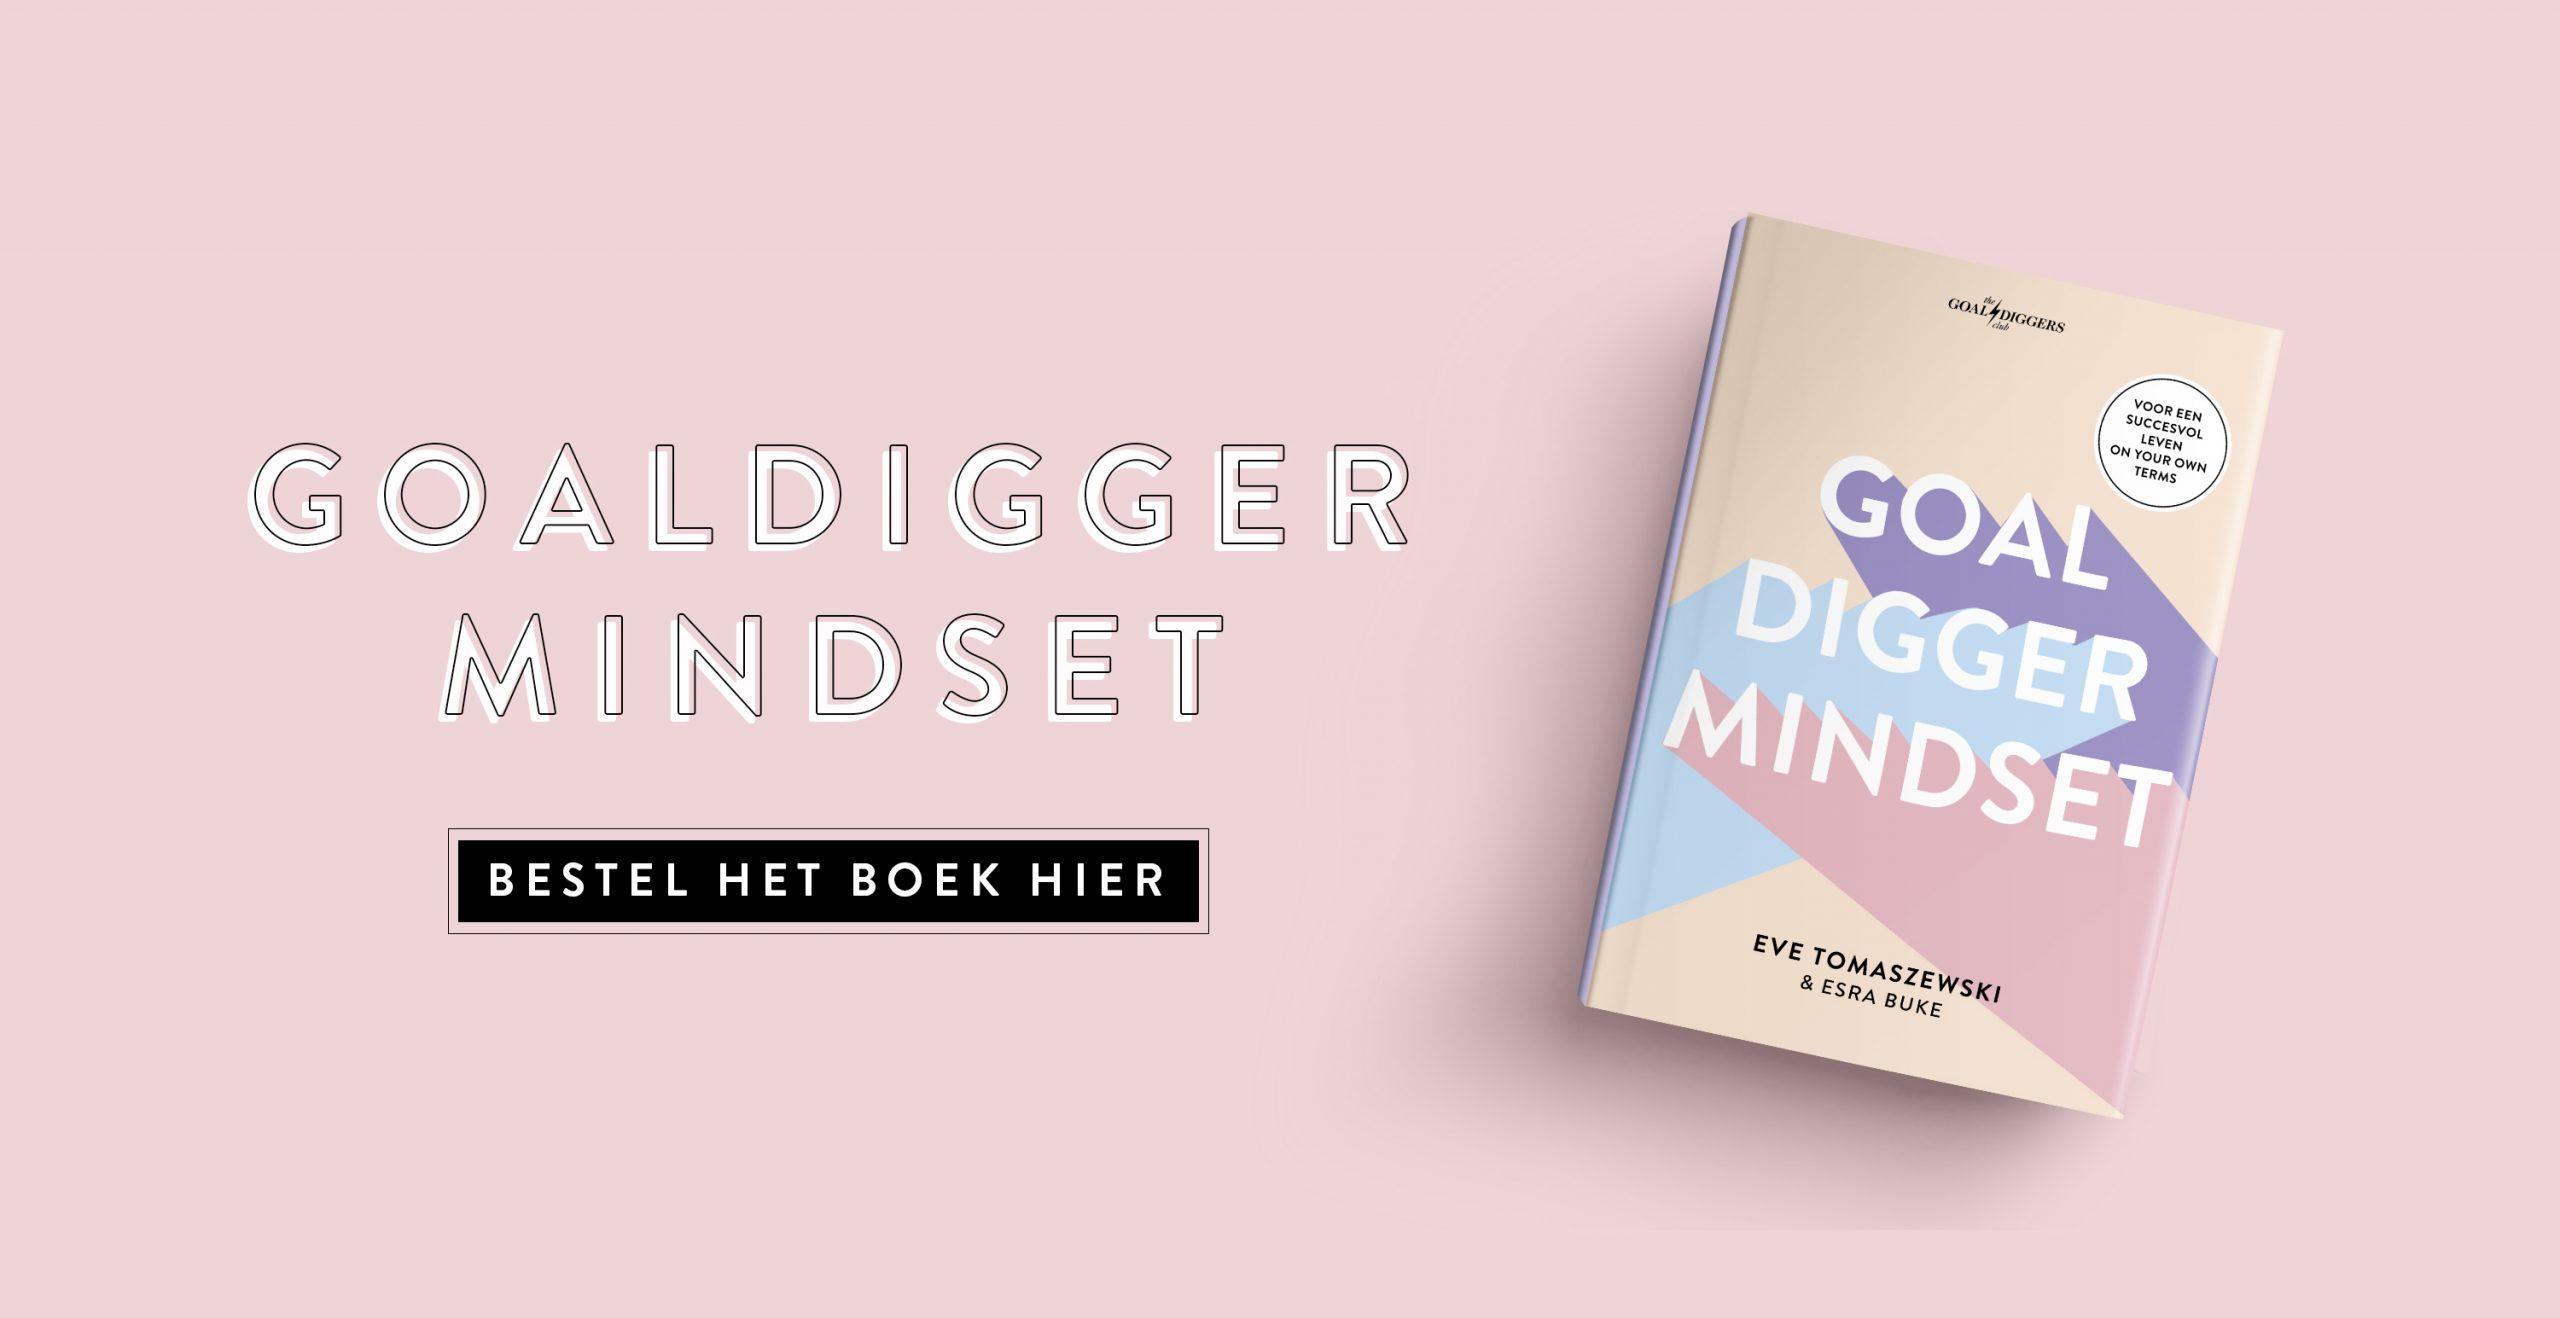 Goaldigger-Mindset-boek